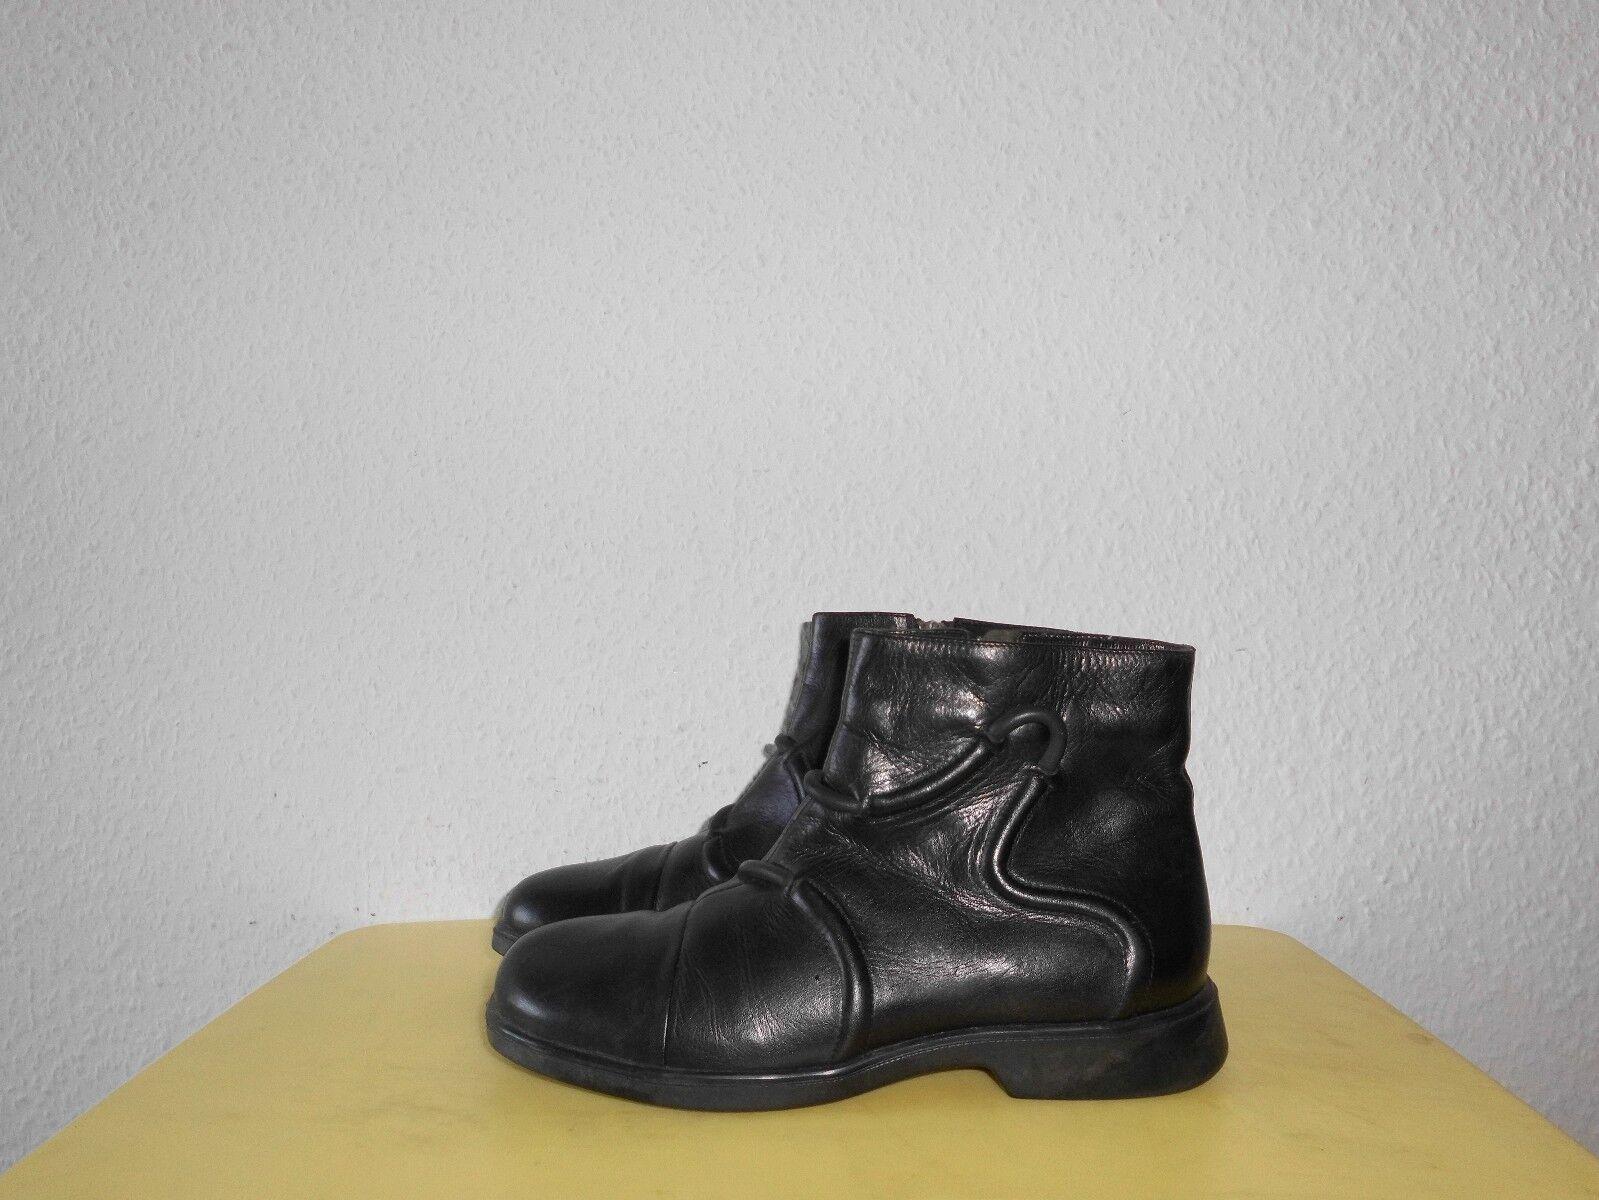 Stiefeletten Boots Think!   Gr.38,5  Leder